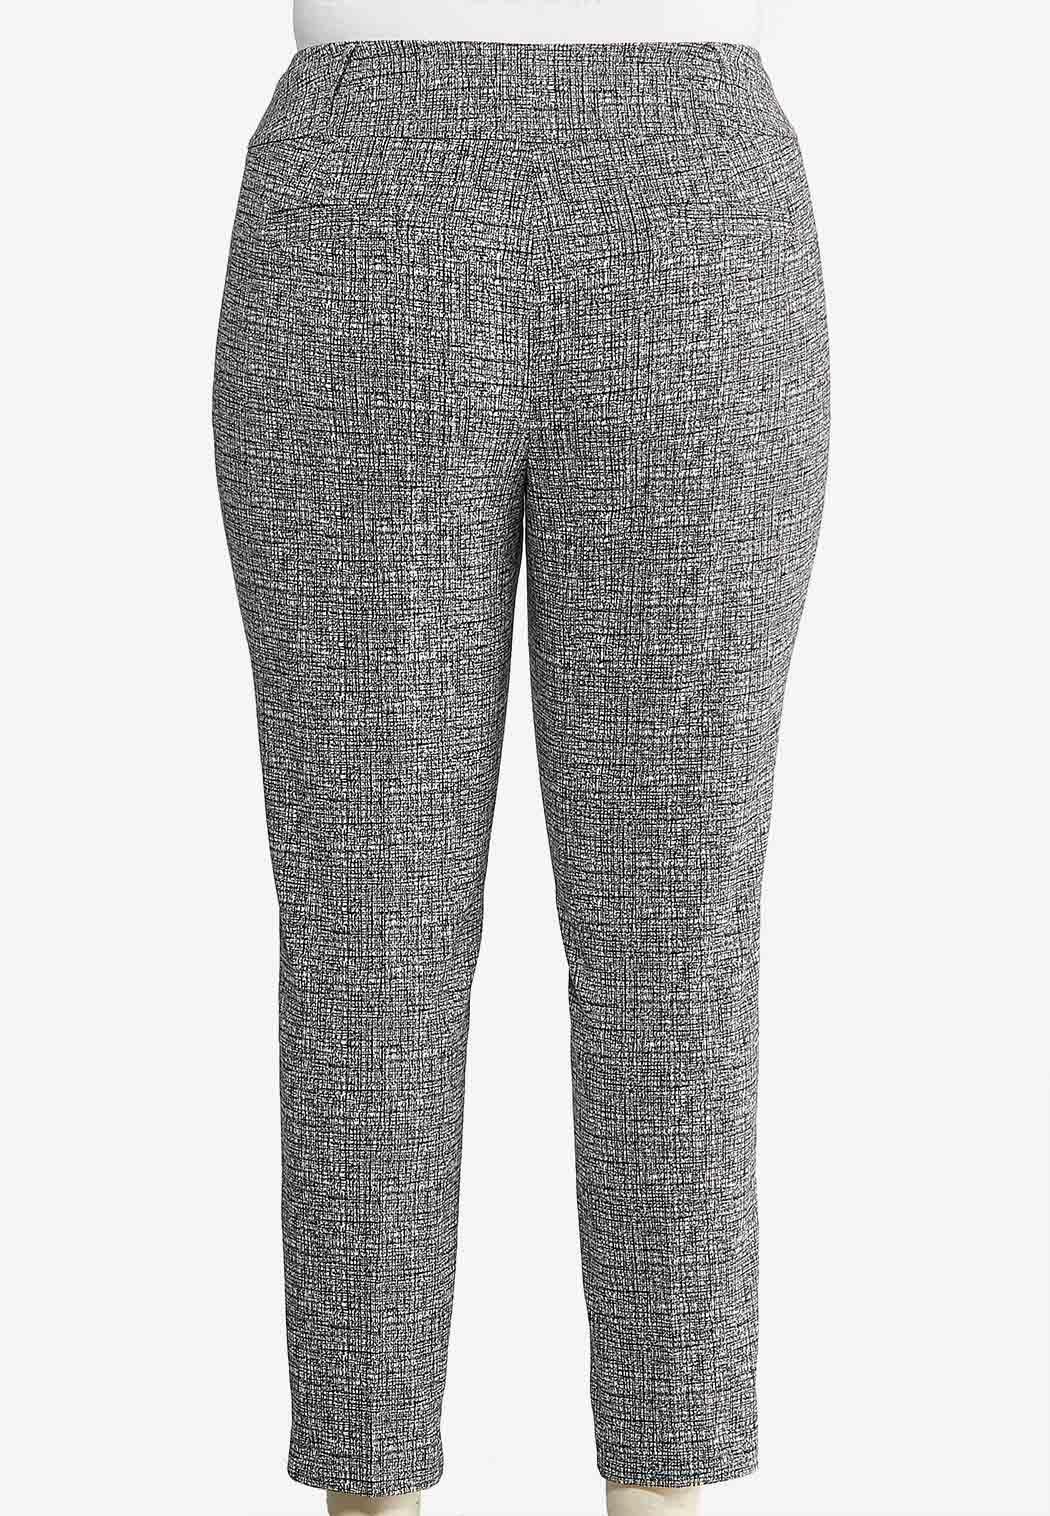 Plus Size Textured Slim Pants (Item #43940643)